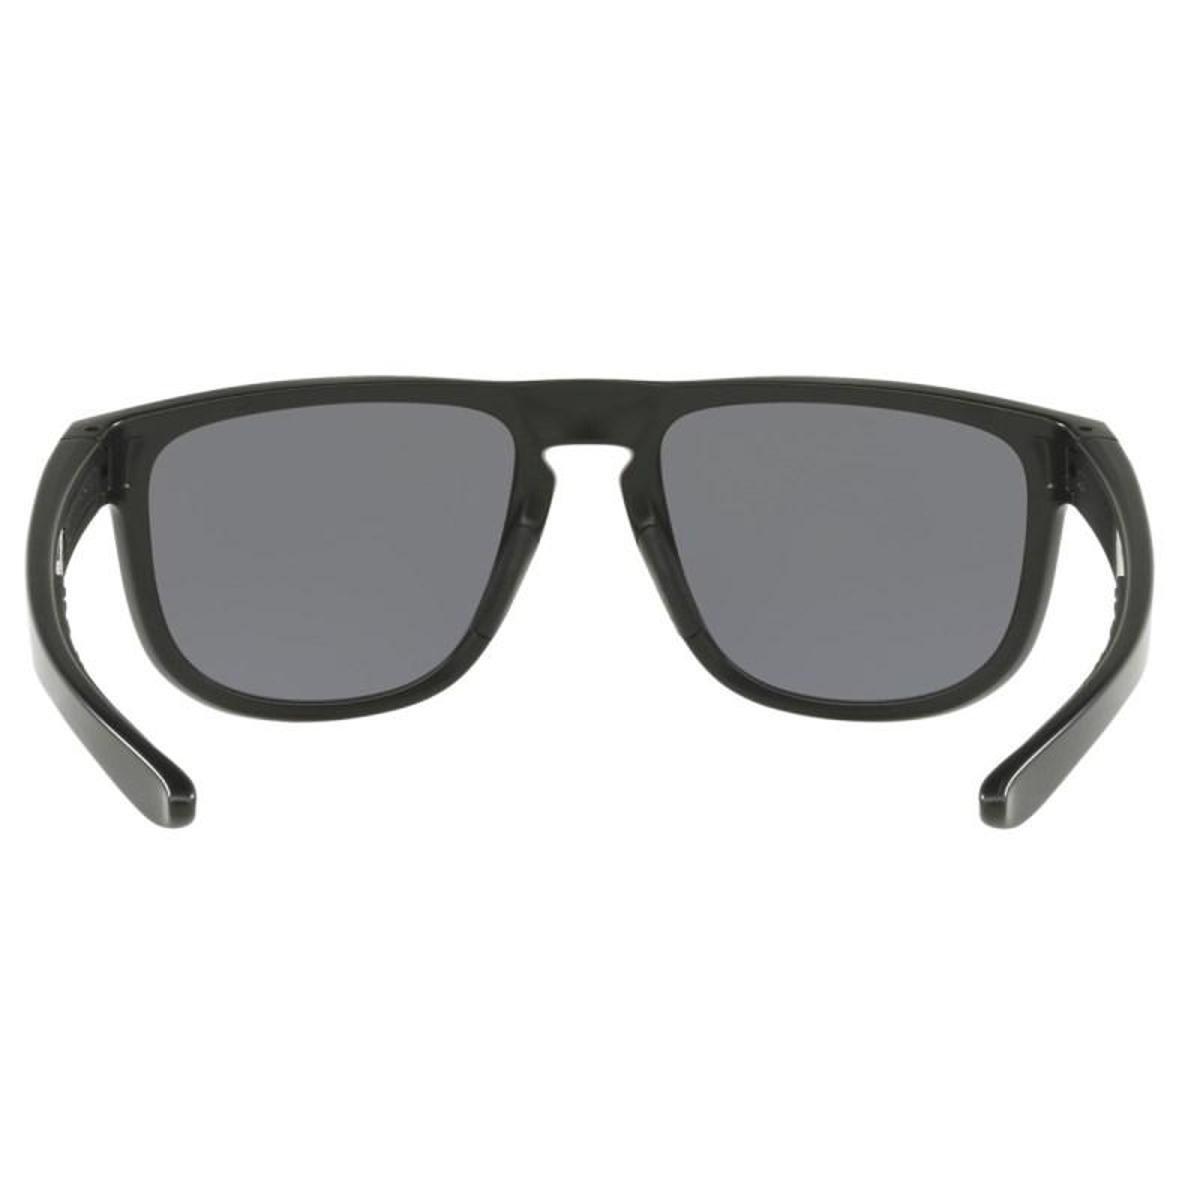 ef5b91d6f5cfa Óculos Oakley Holbrook R Matte Black   Grey 9377- - Preto - Compre ...